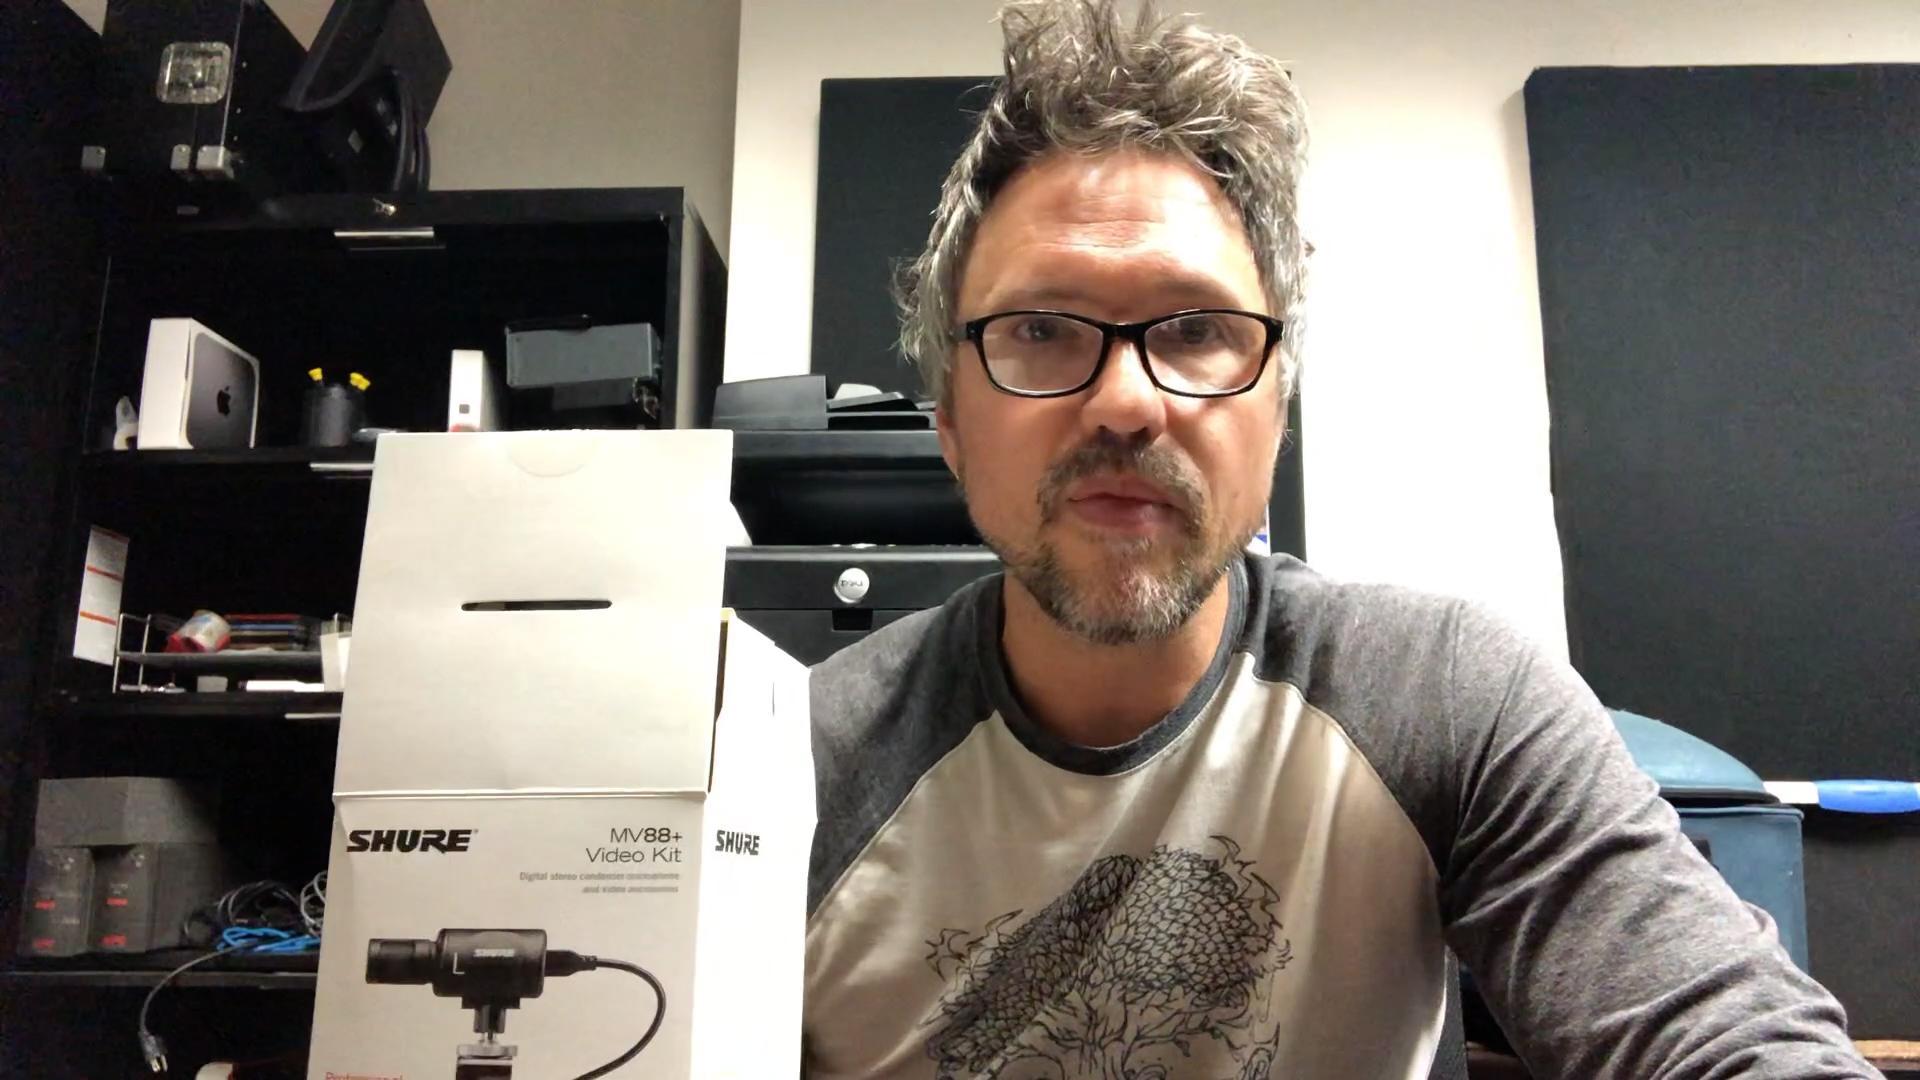 Product Review – Shure MV88+Video Kit – Audio